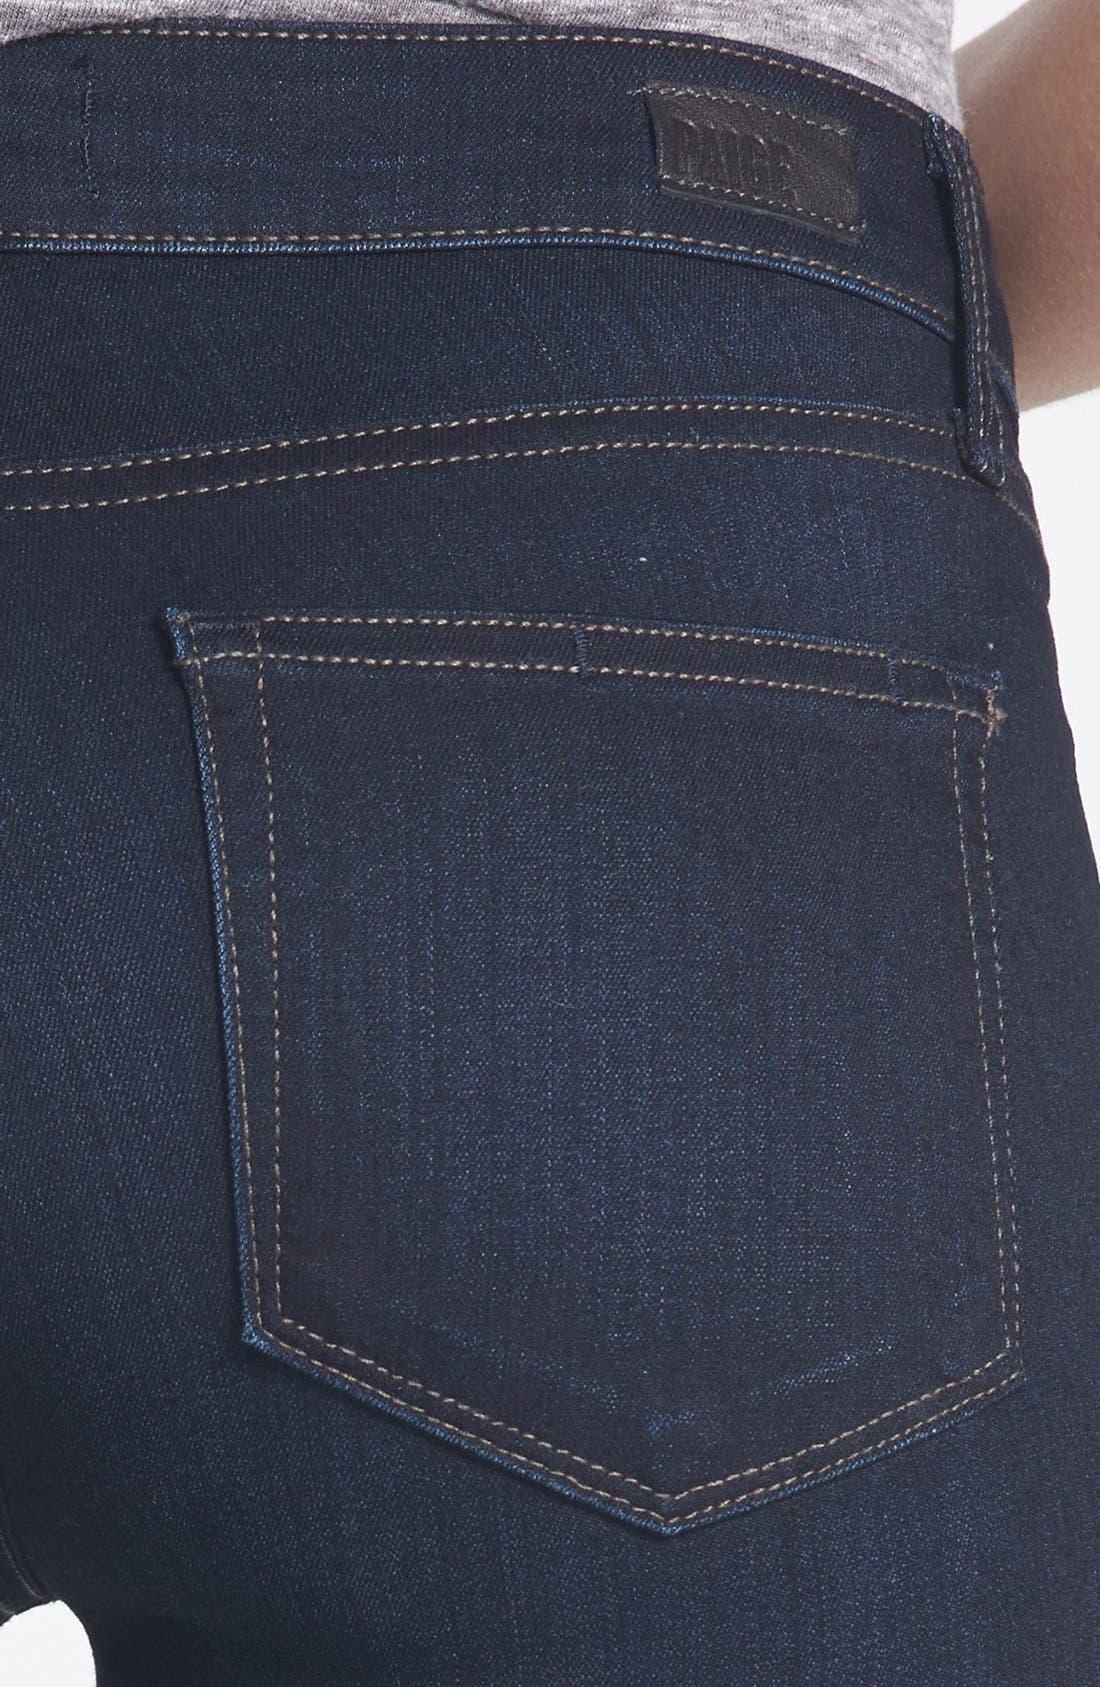 'Transcend - Skyline' Skinny Jeans,                             Alternate thumbnail 3, color,                             400